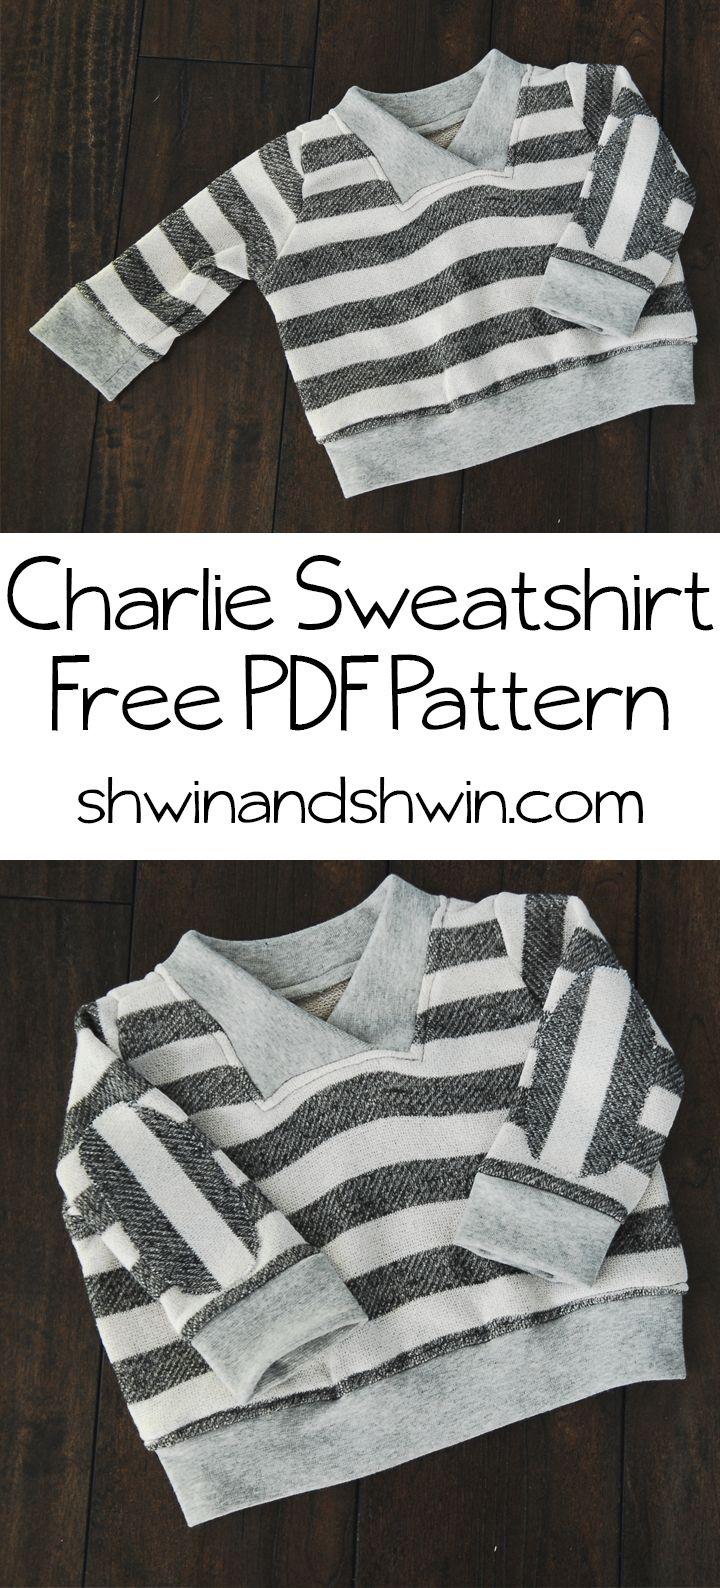 Charlie Sweatshirt    Free Sweatshirt Pattern 6  to 12 months.  Adorable. Free PDF :  http://shwinandshwin.com/wp-content/uploads/2014/01/Charlie1.pdf